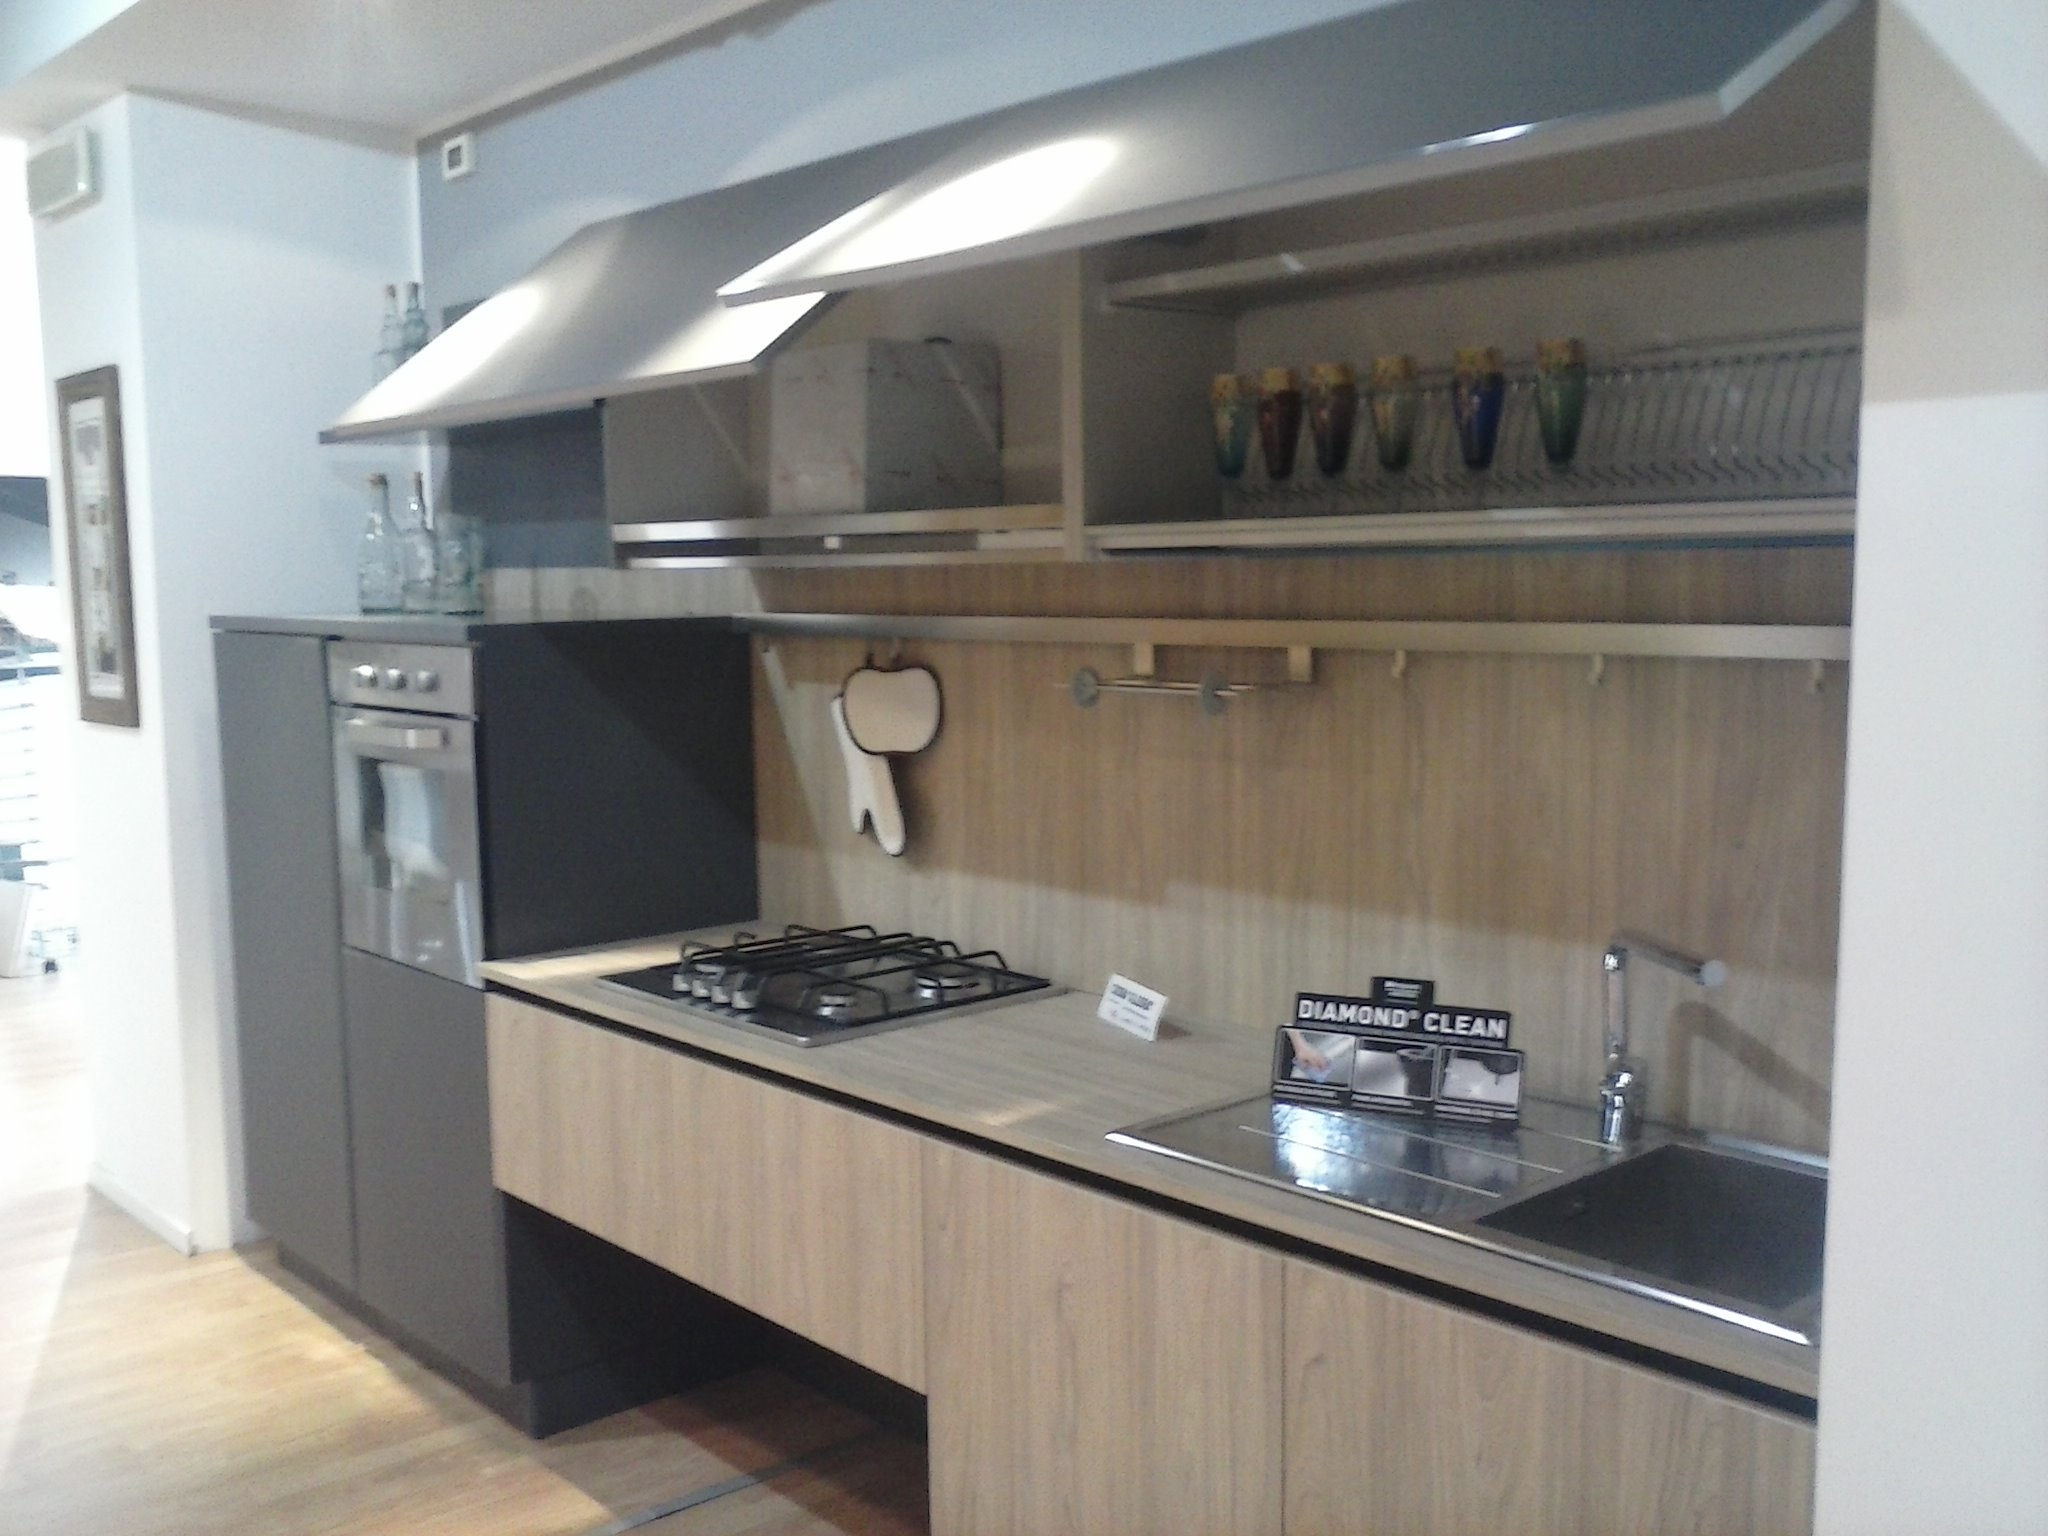 Cucina stosa cucine aleve 39 moderna laminato materico neutra cucine a prezzi scontati - Cucine stosa prezzi ...